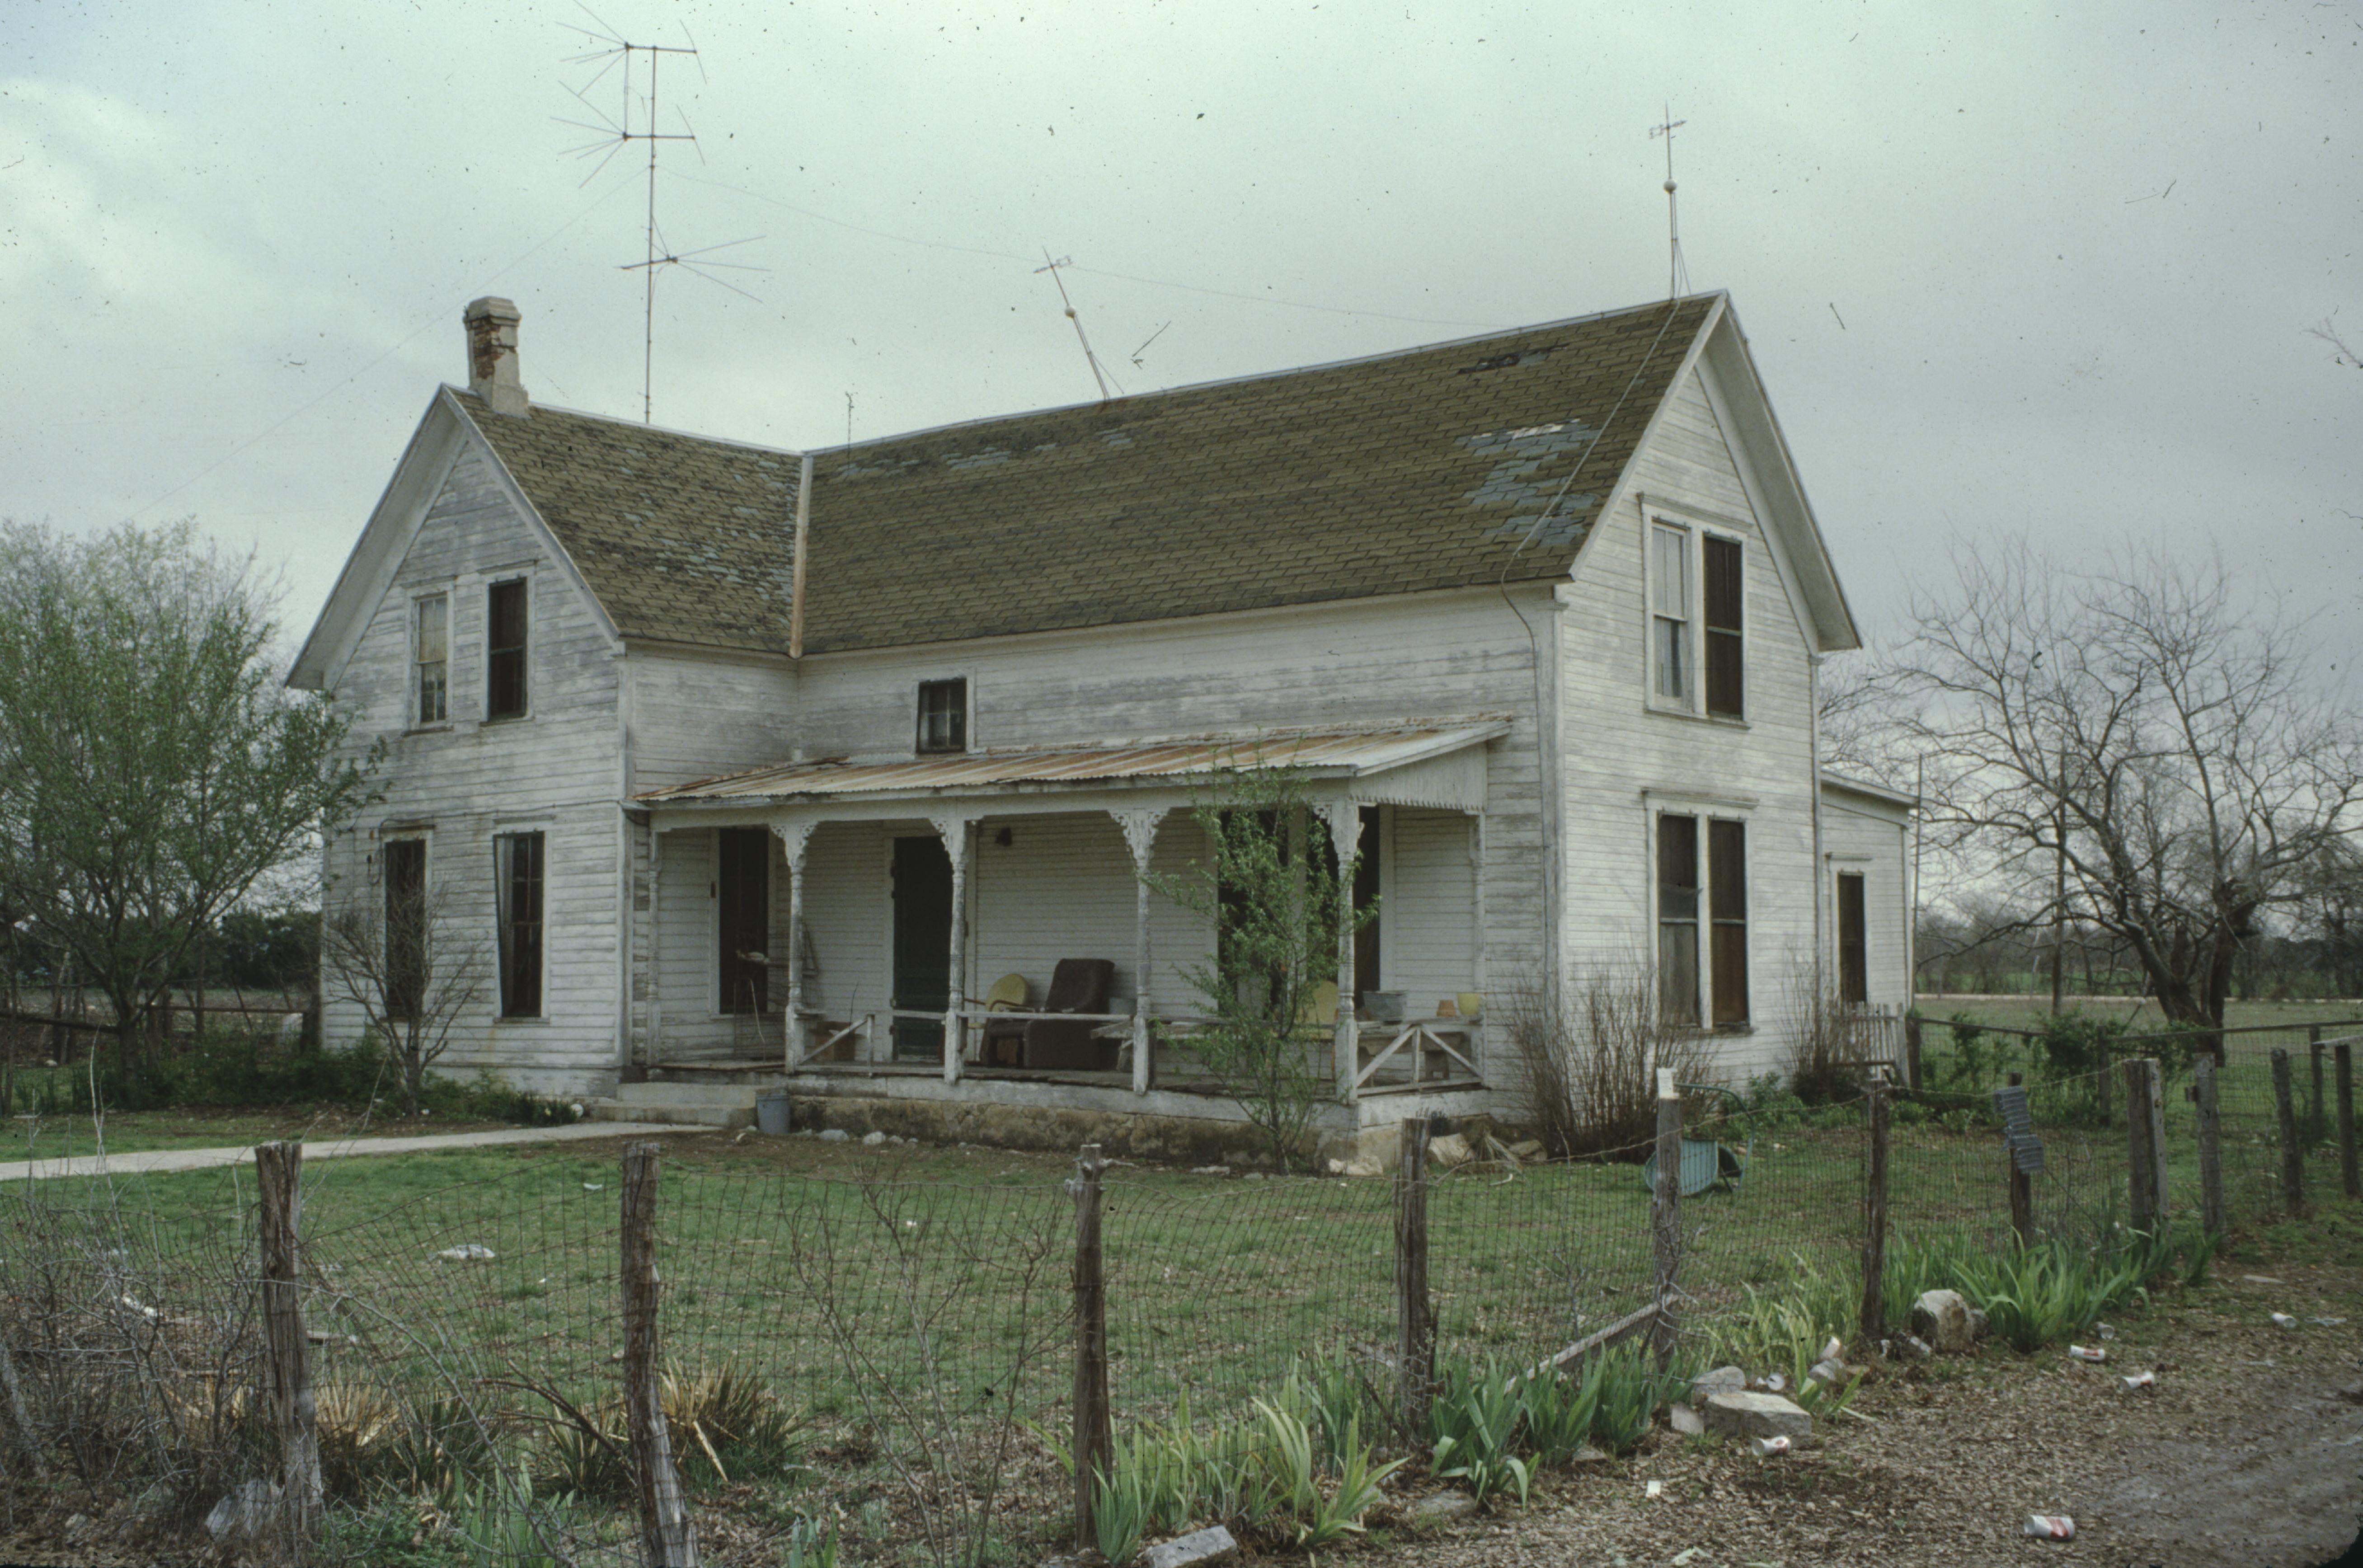 Tom Rogstad House